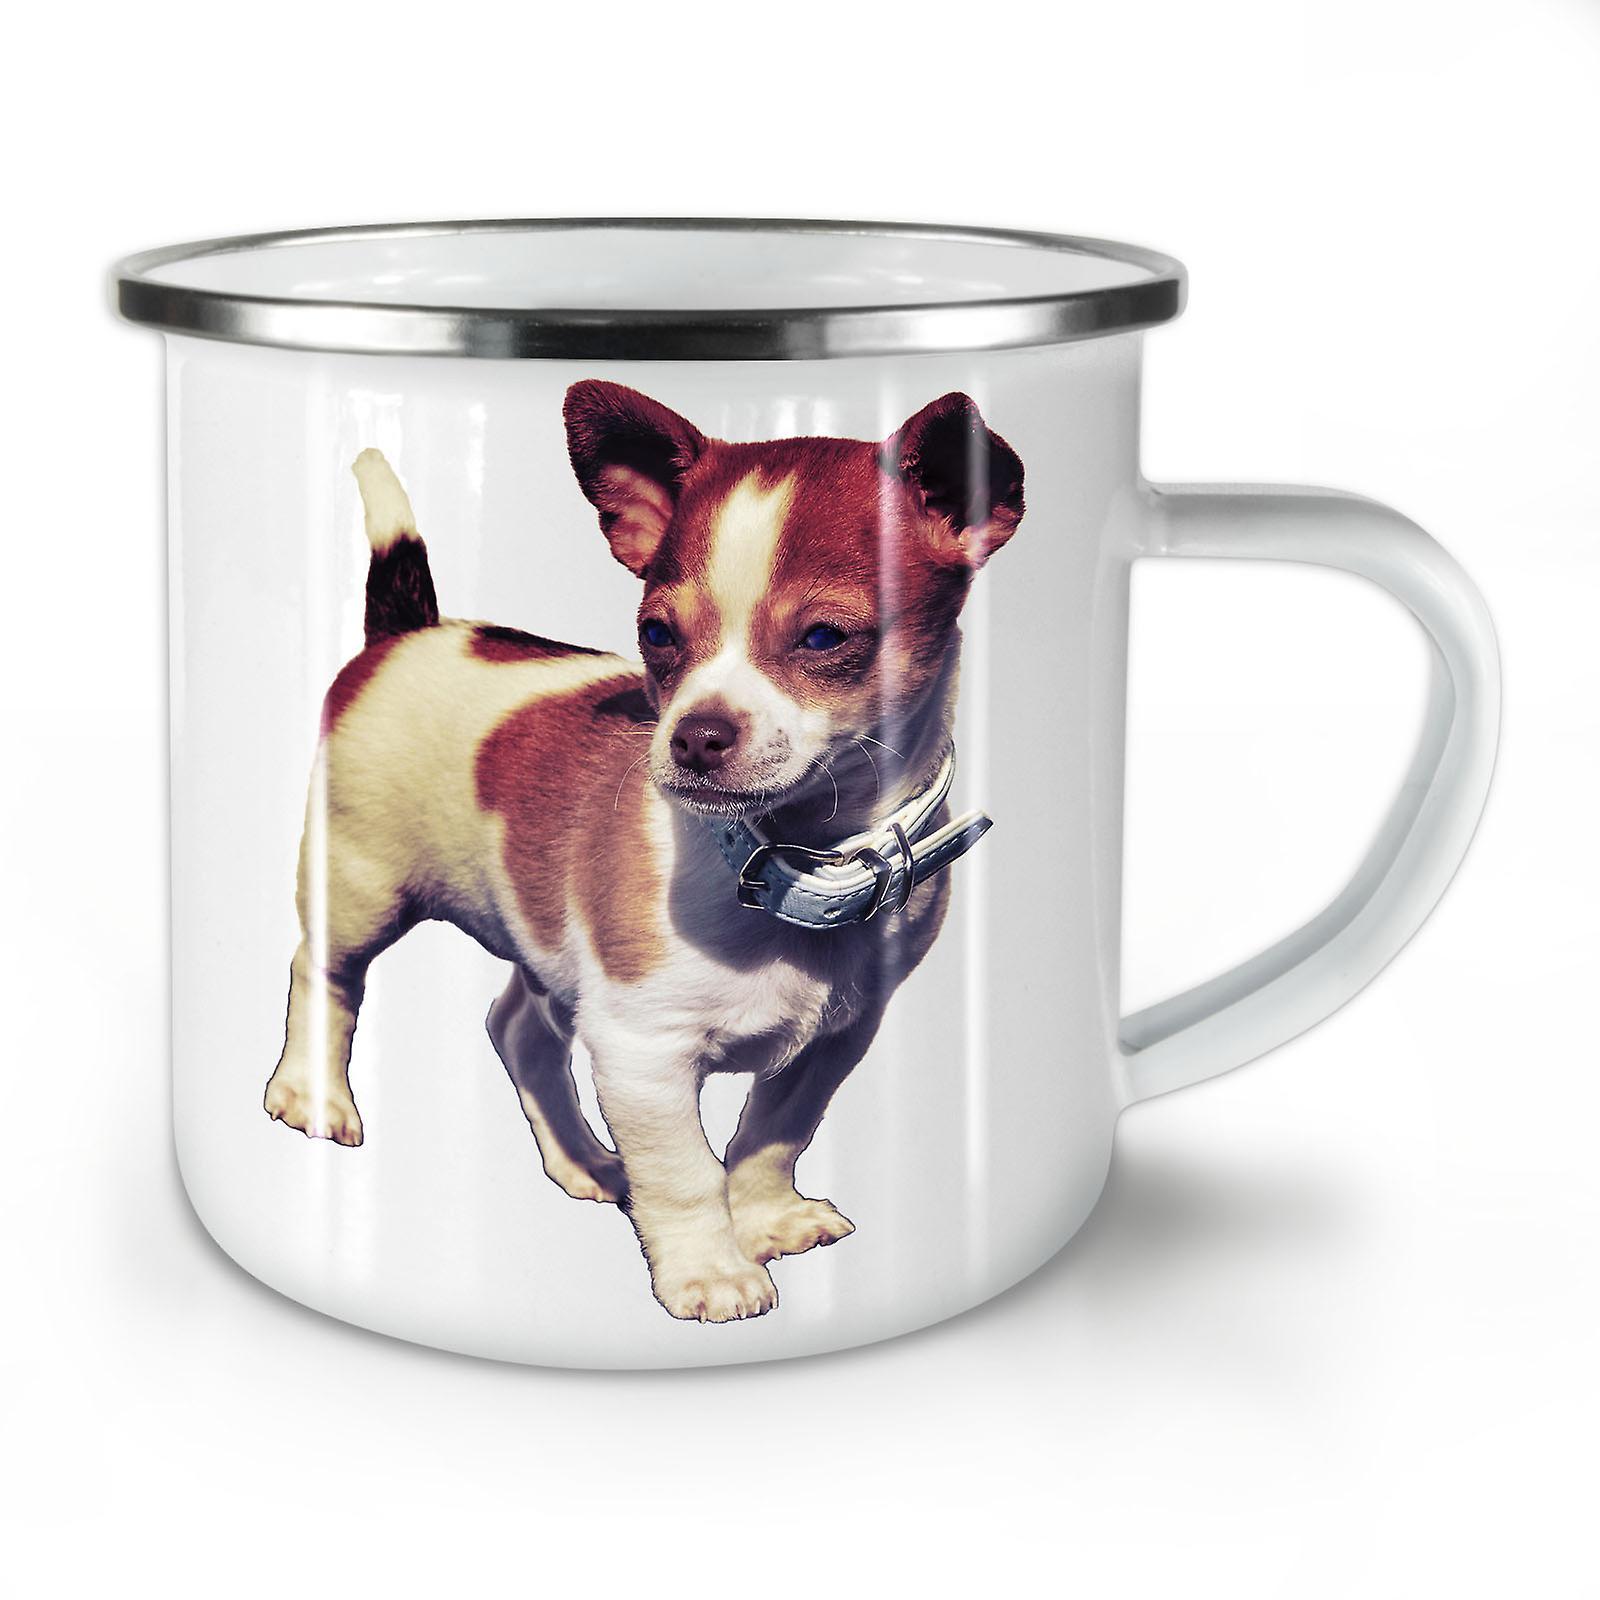 Mignon Animal Café Chiot Nouveau Émail OzWellcoda Mug10 Whitetea 4Rq3AL5j